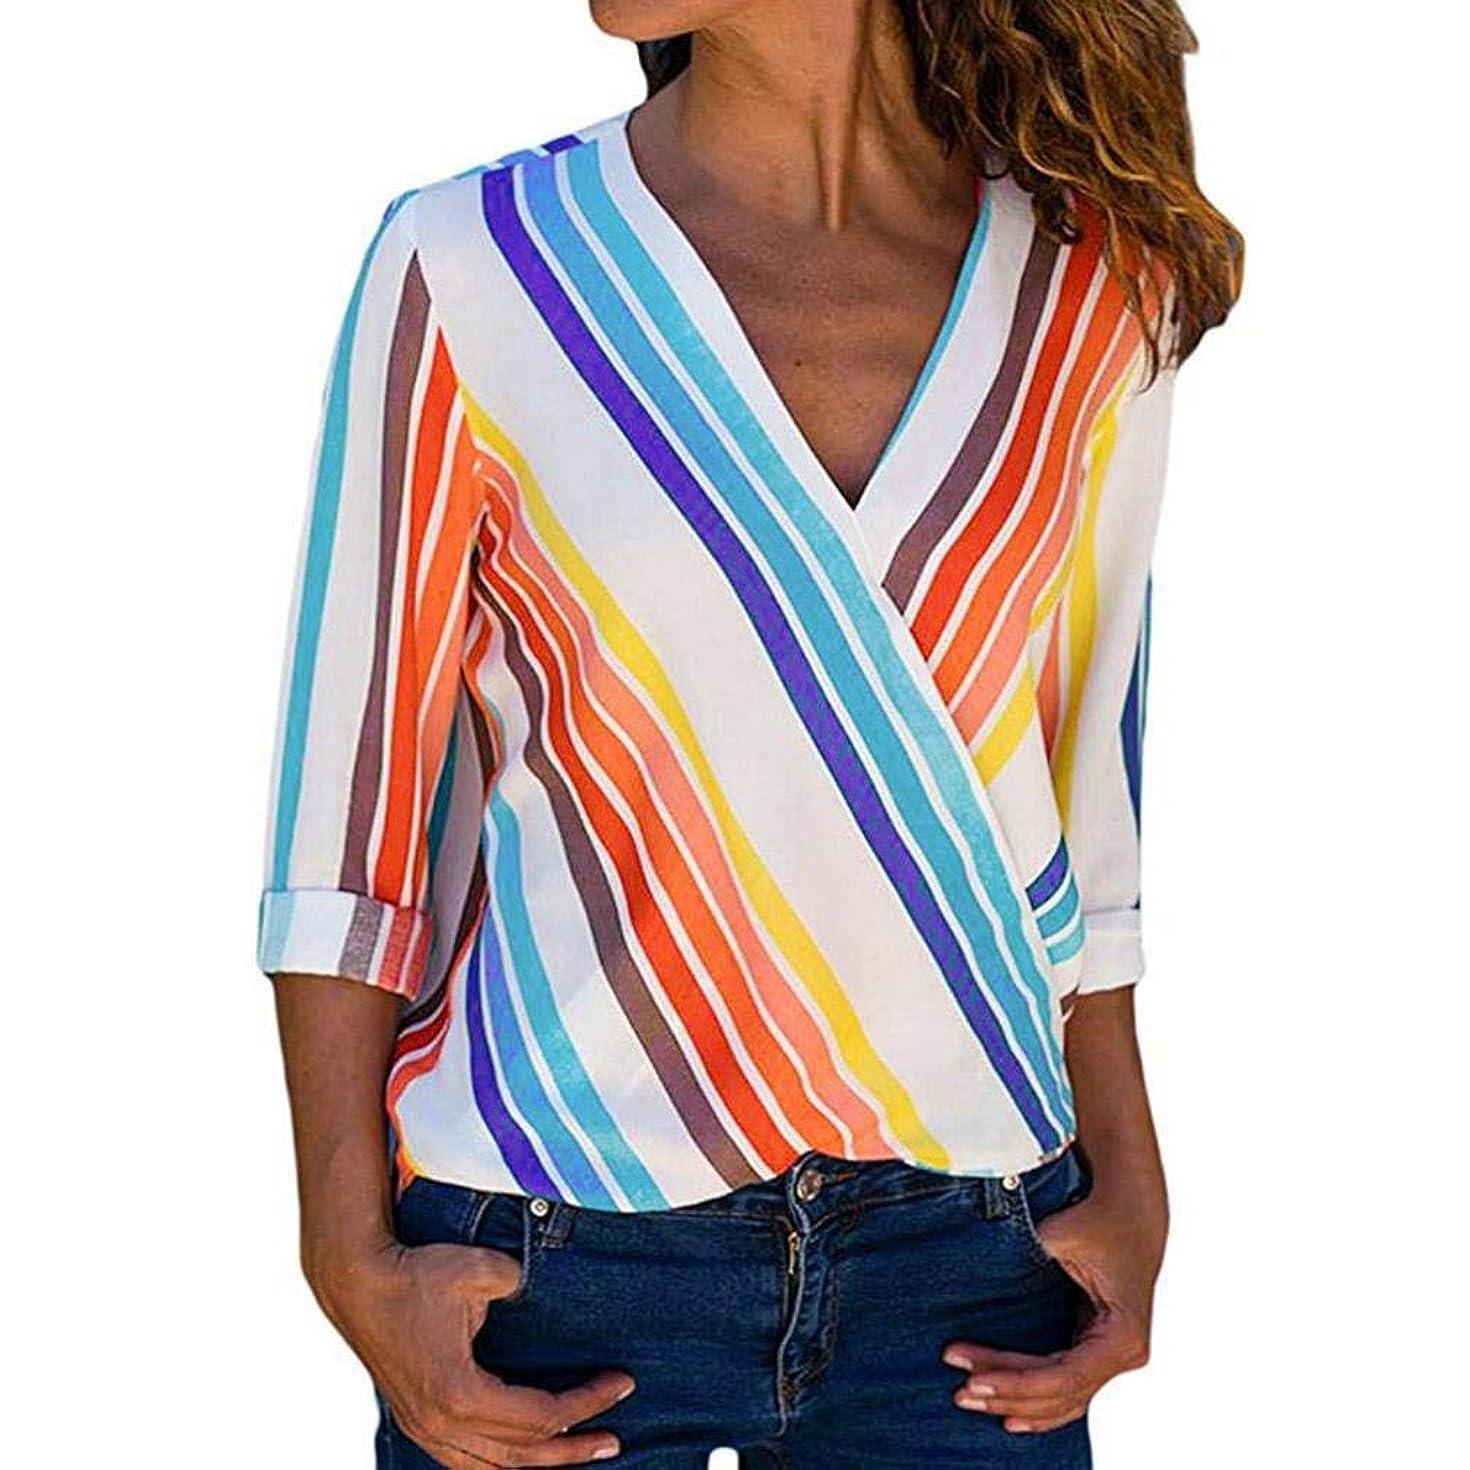 Howstar Women's Long Sleeve T-Shirt Rainbow Striped Irregular Blouse Sexy V-Neck Shrits Casual Tops